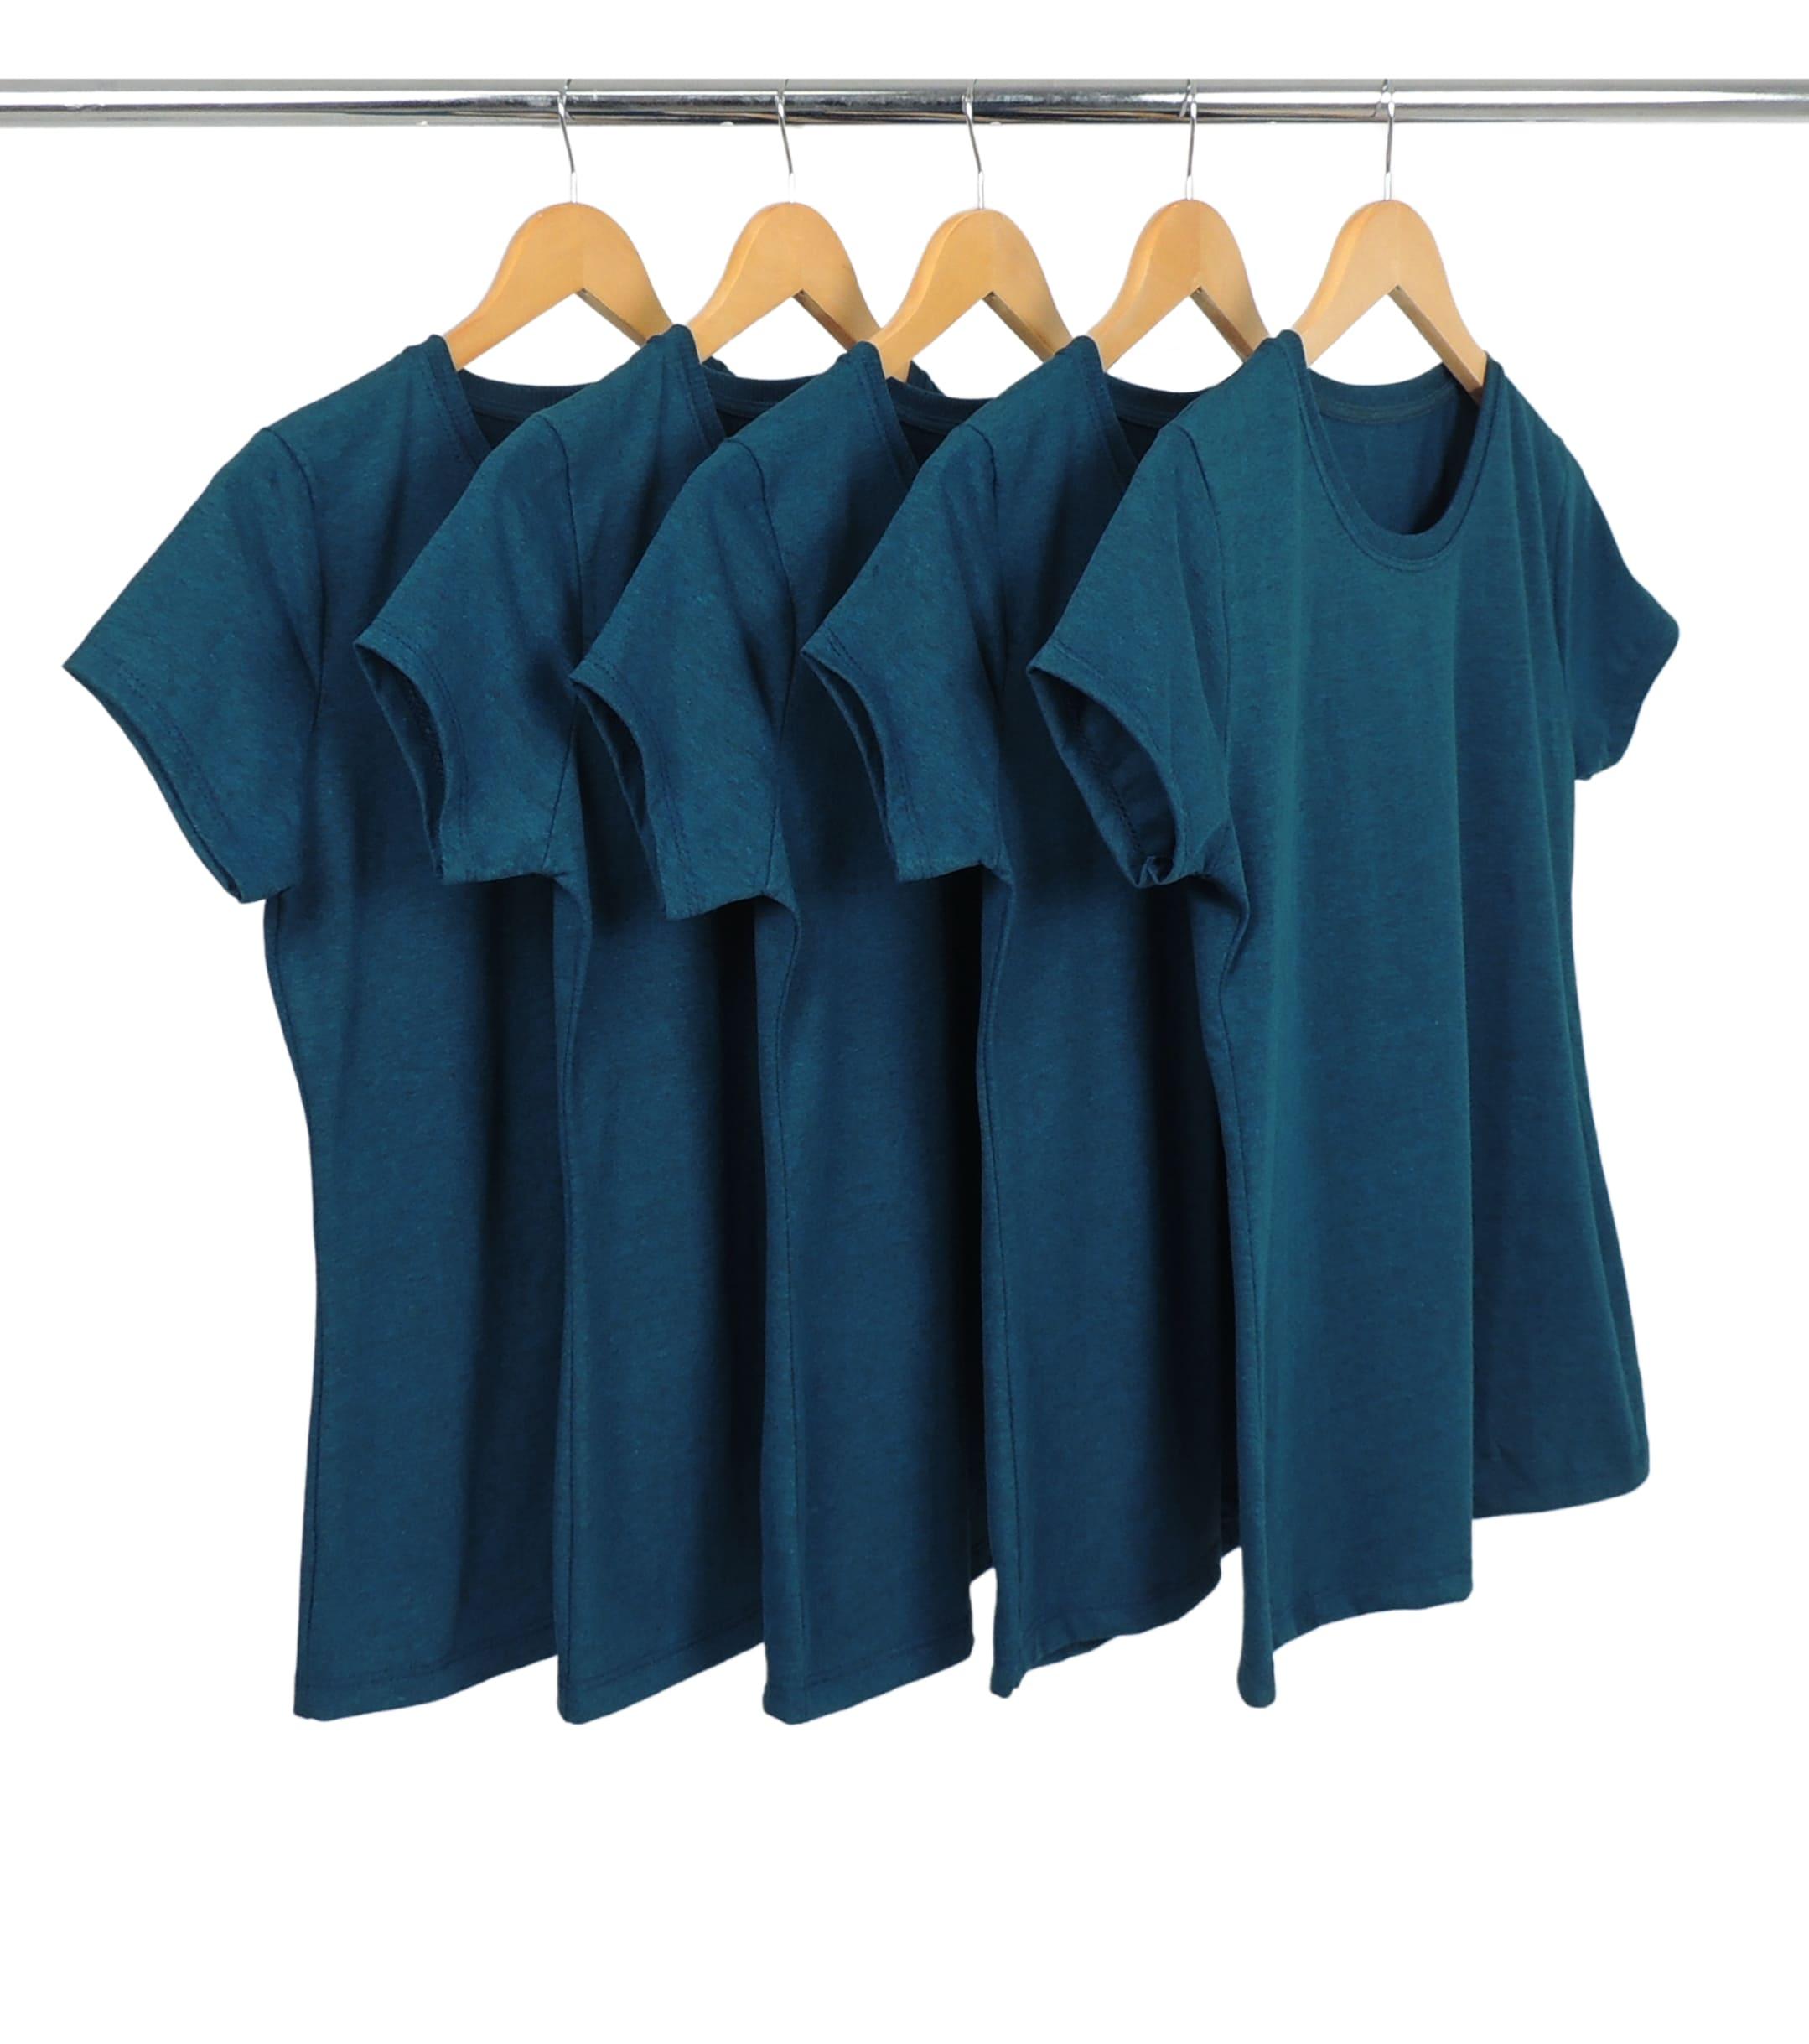 Kit 5 Camisetas Femininas Comfort Mescla Petróleo